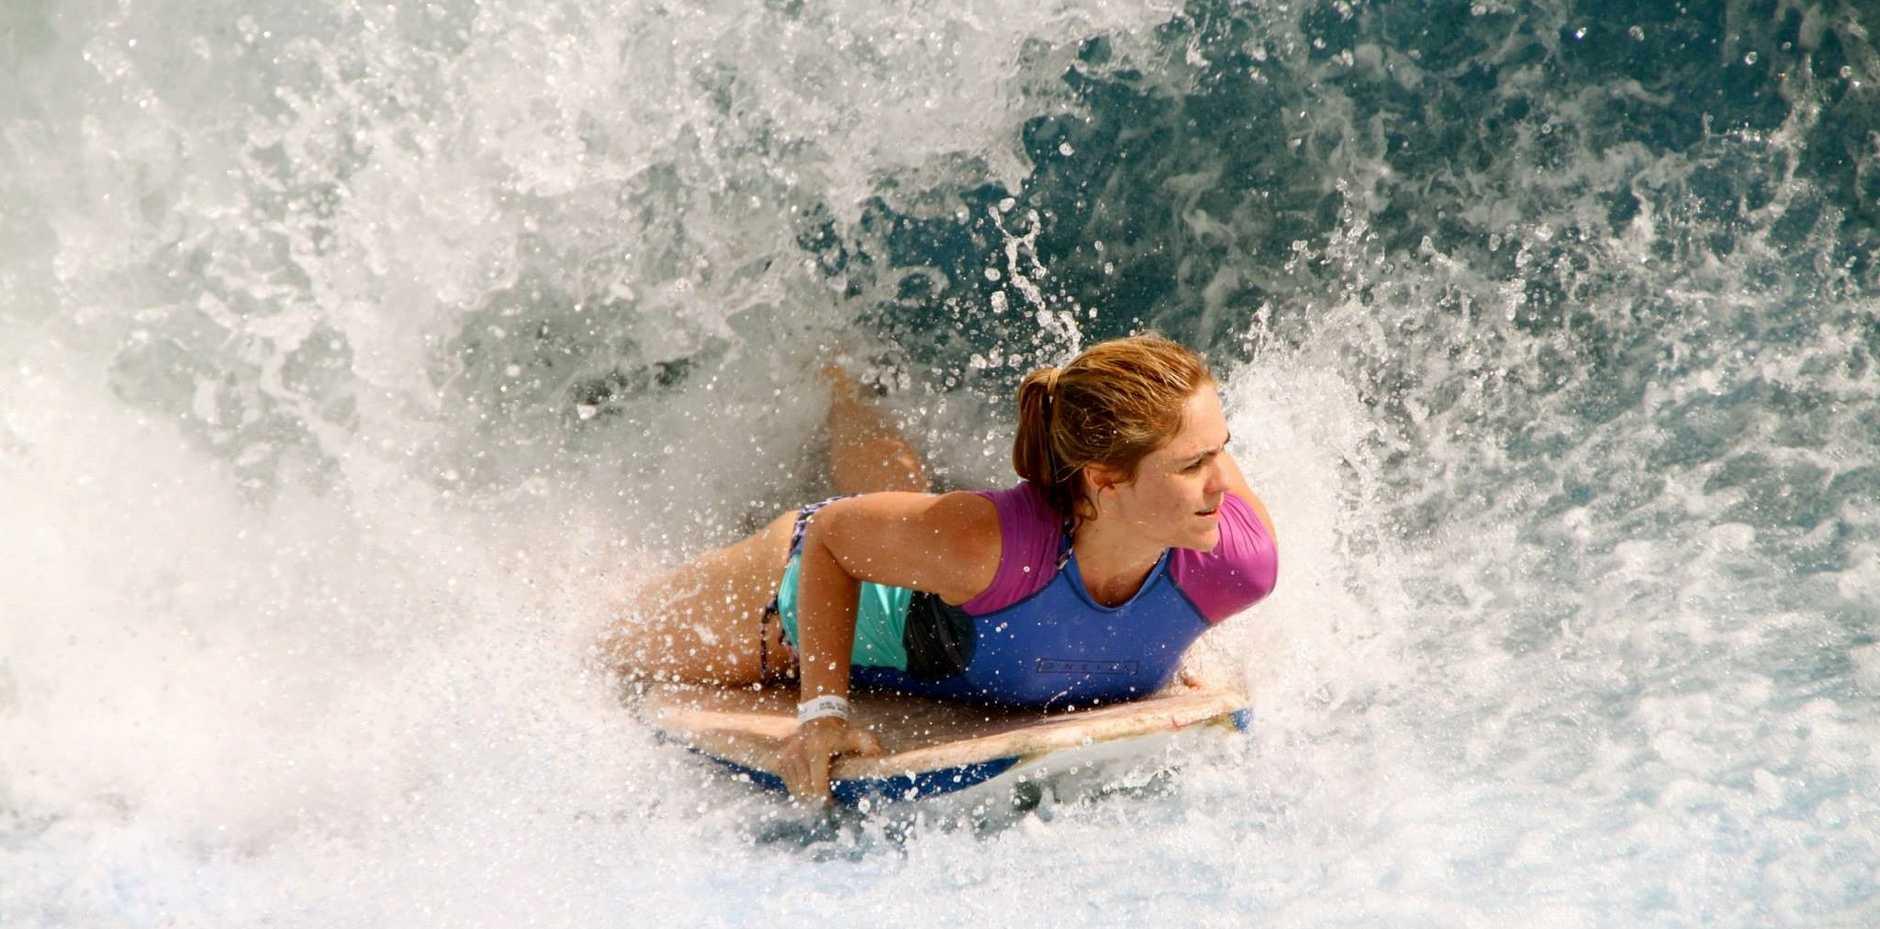 Rebecca Gallehawk takes on the flowboarding wave machine at Singapore's Sentosa Island.